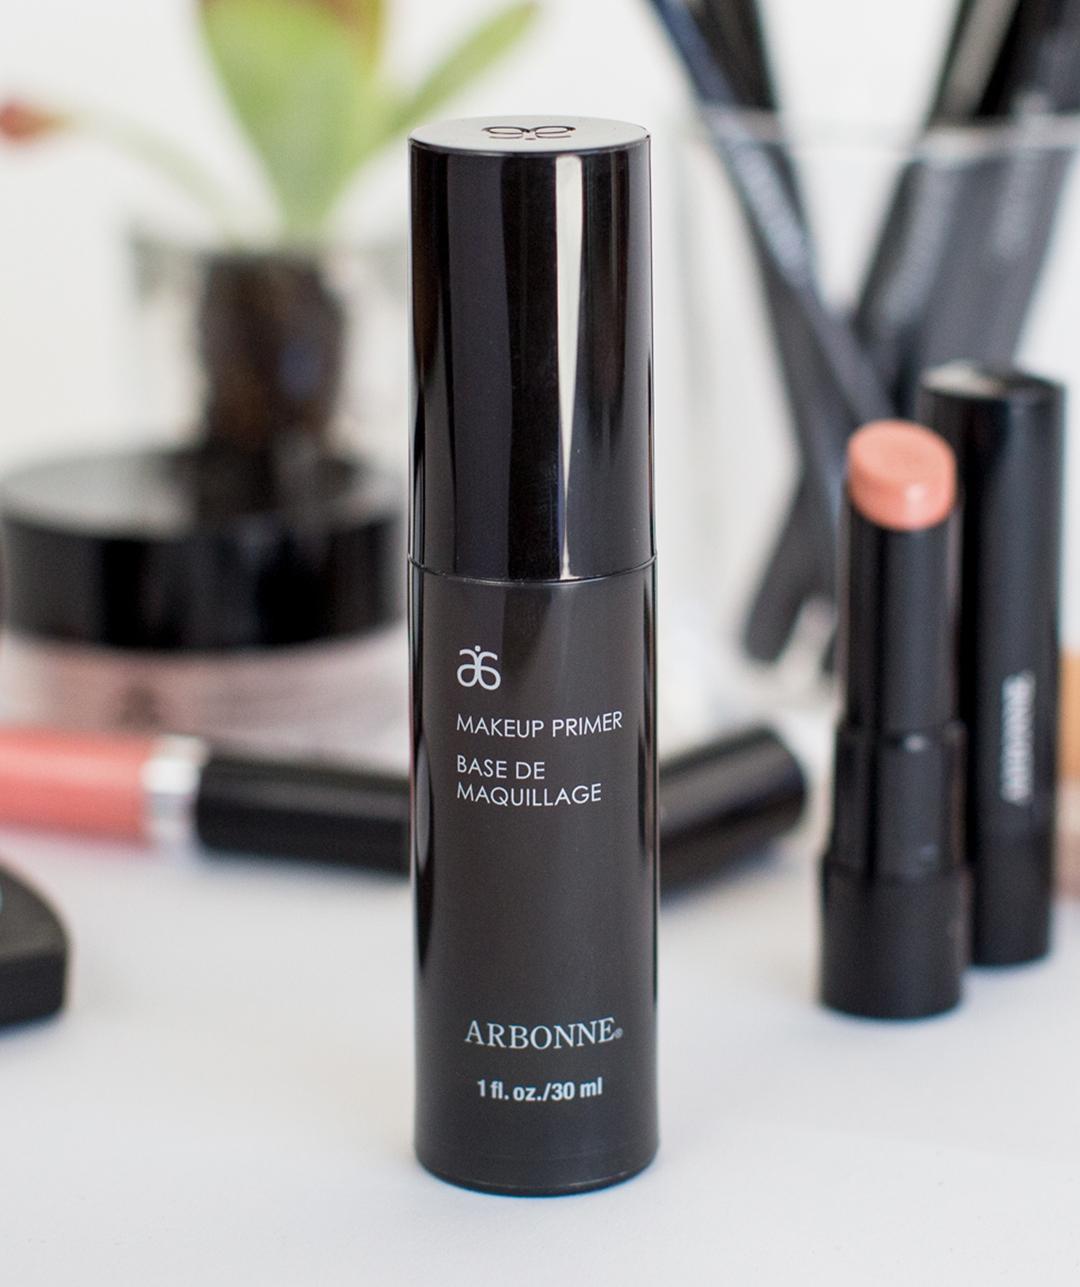 Makeup Primer social_image.png